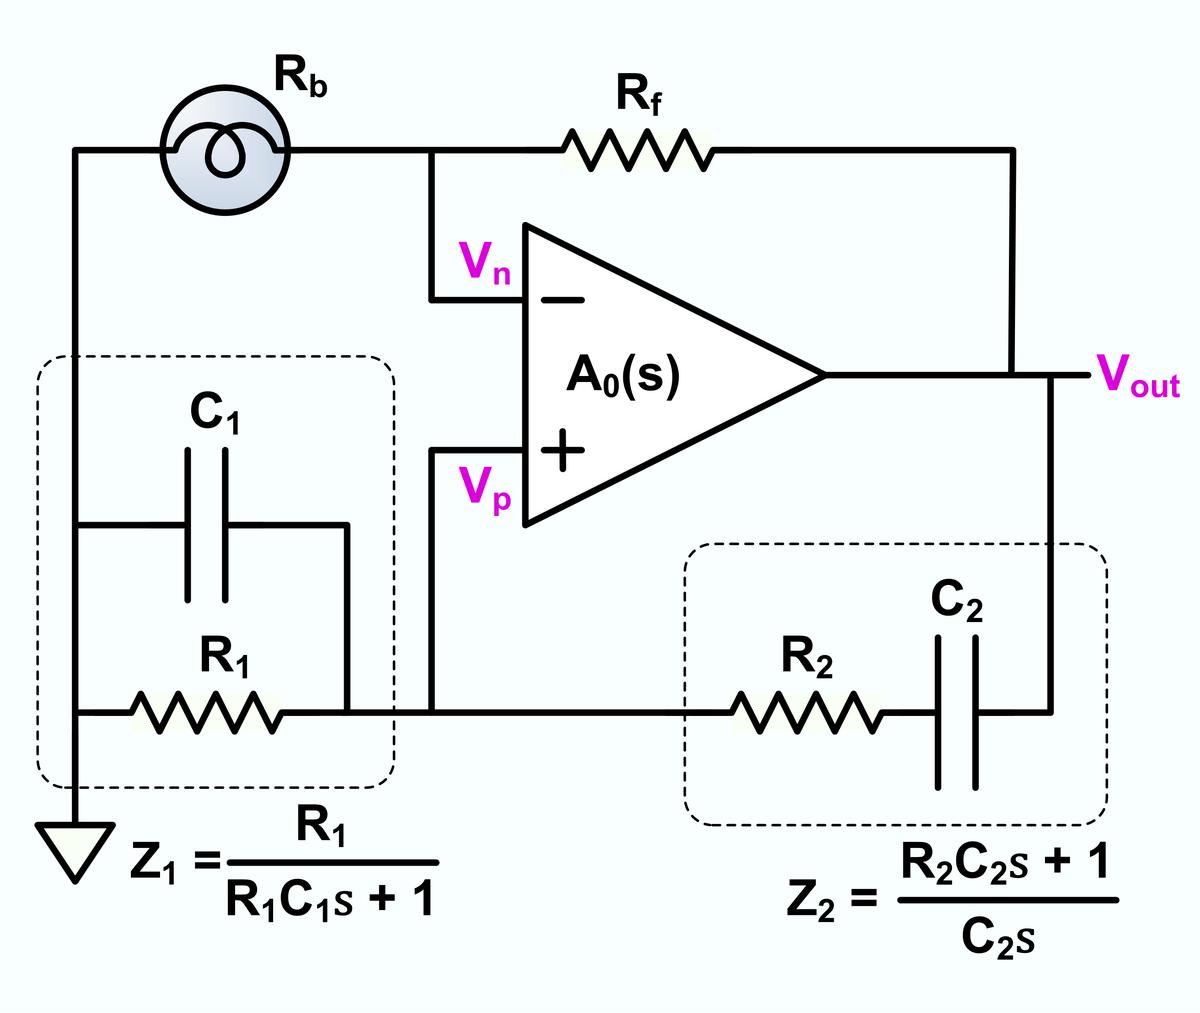 hight resolution of simple wienbridge oscillator circuit diagram tradeoficcom wiring 741 timer circuit diagram tradeoficcom schema wiring diagram simple